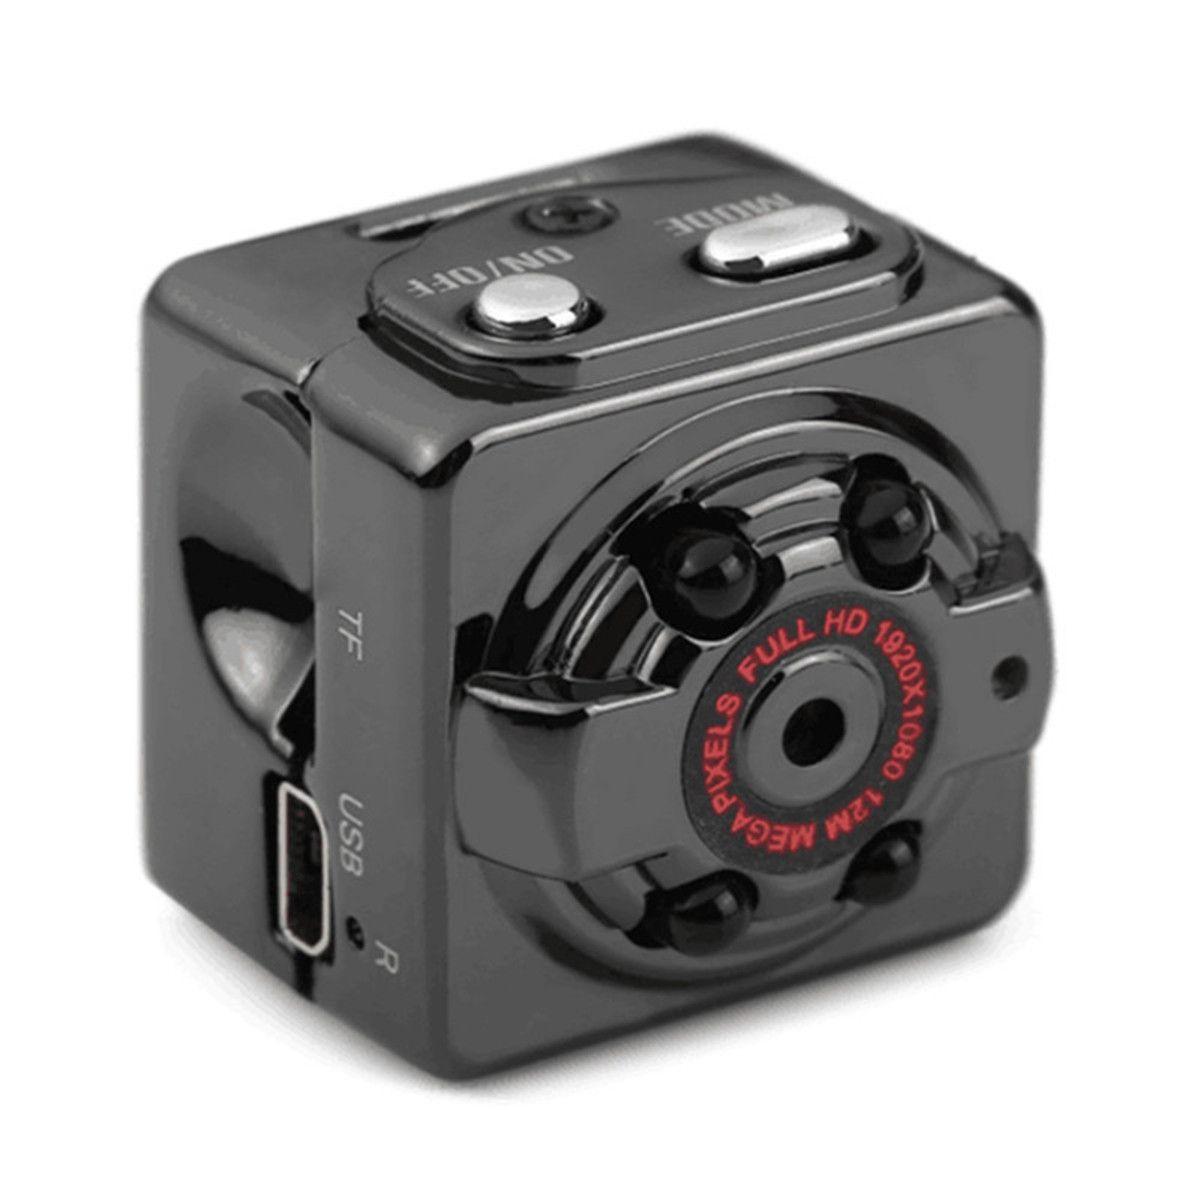 Security & Protection Surveillance Cameras Sq8 Mini Camera Full Hd 1080p Micro Camera Ir Night Vision Sport Dv Camera Motion Sensor Dvr Camcorder Mini Cam Surveillance Cam